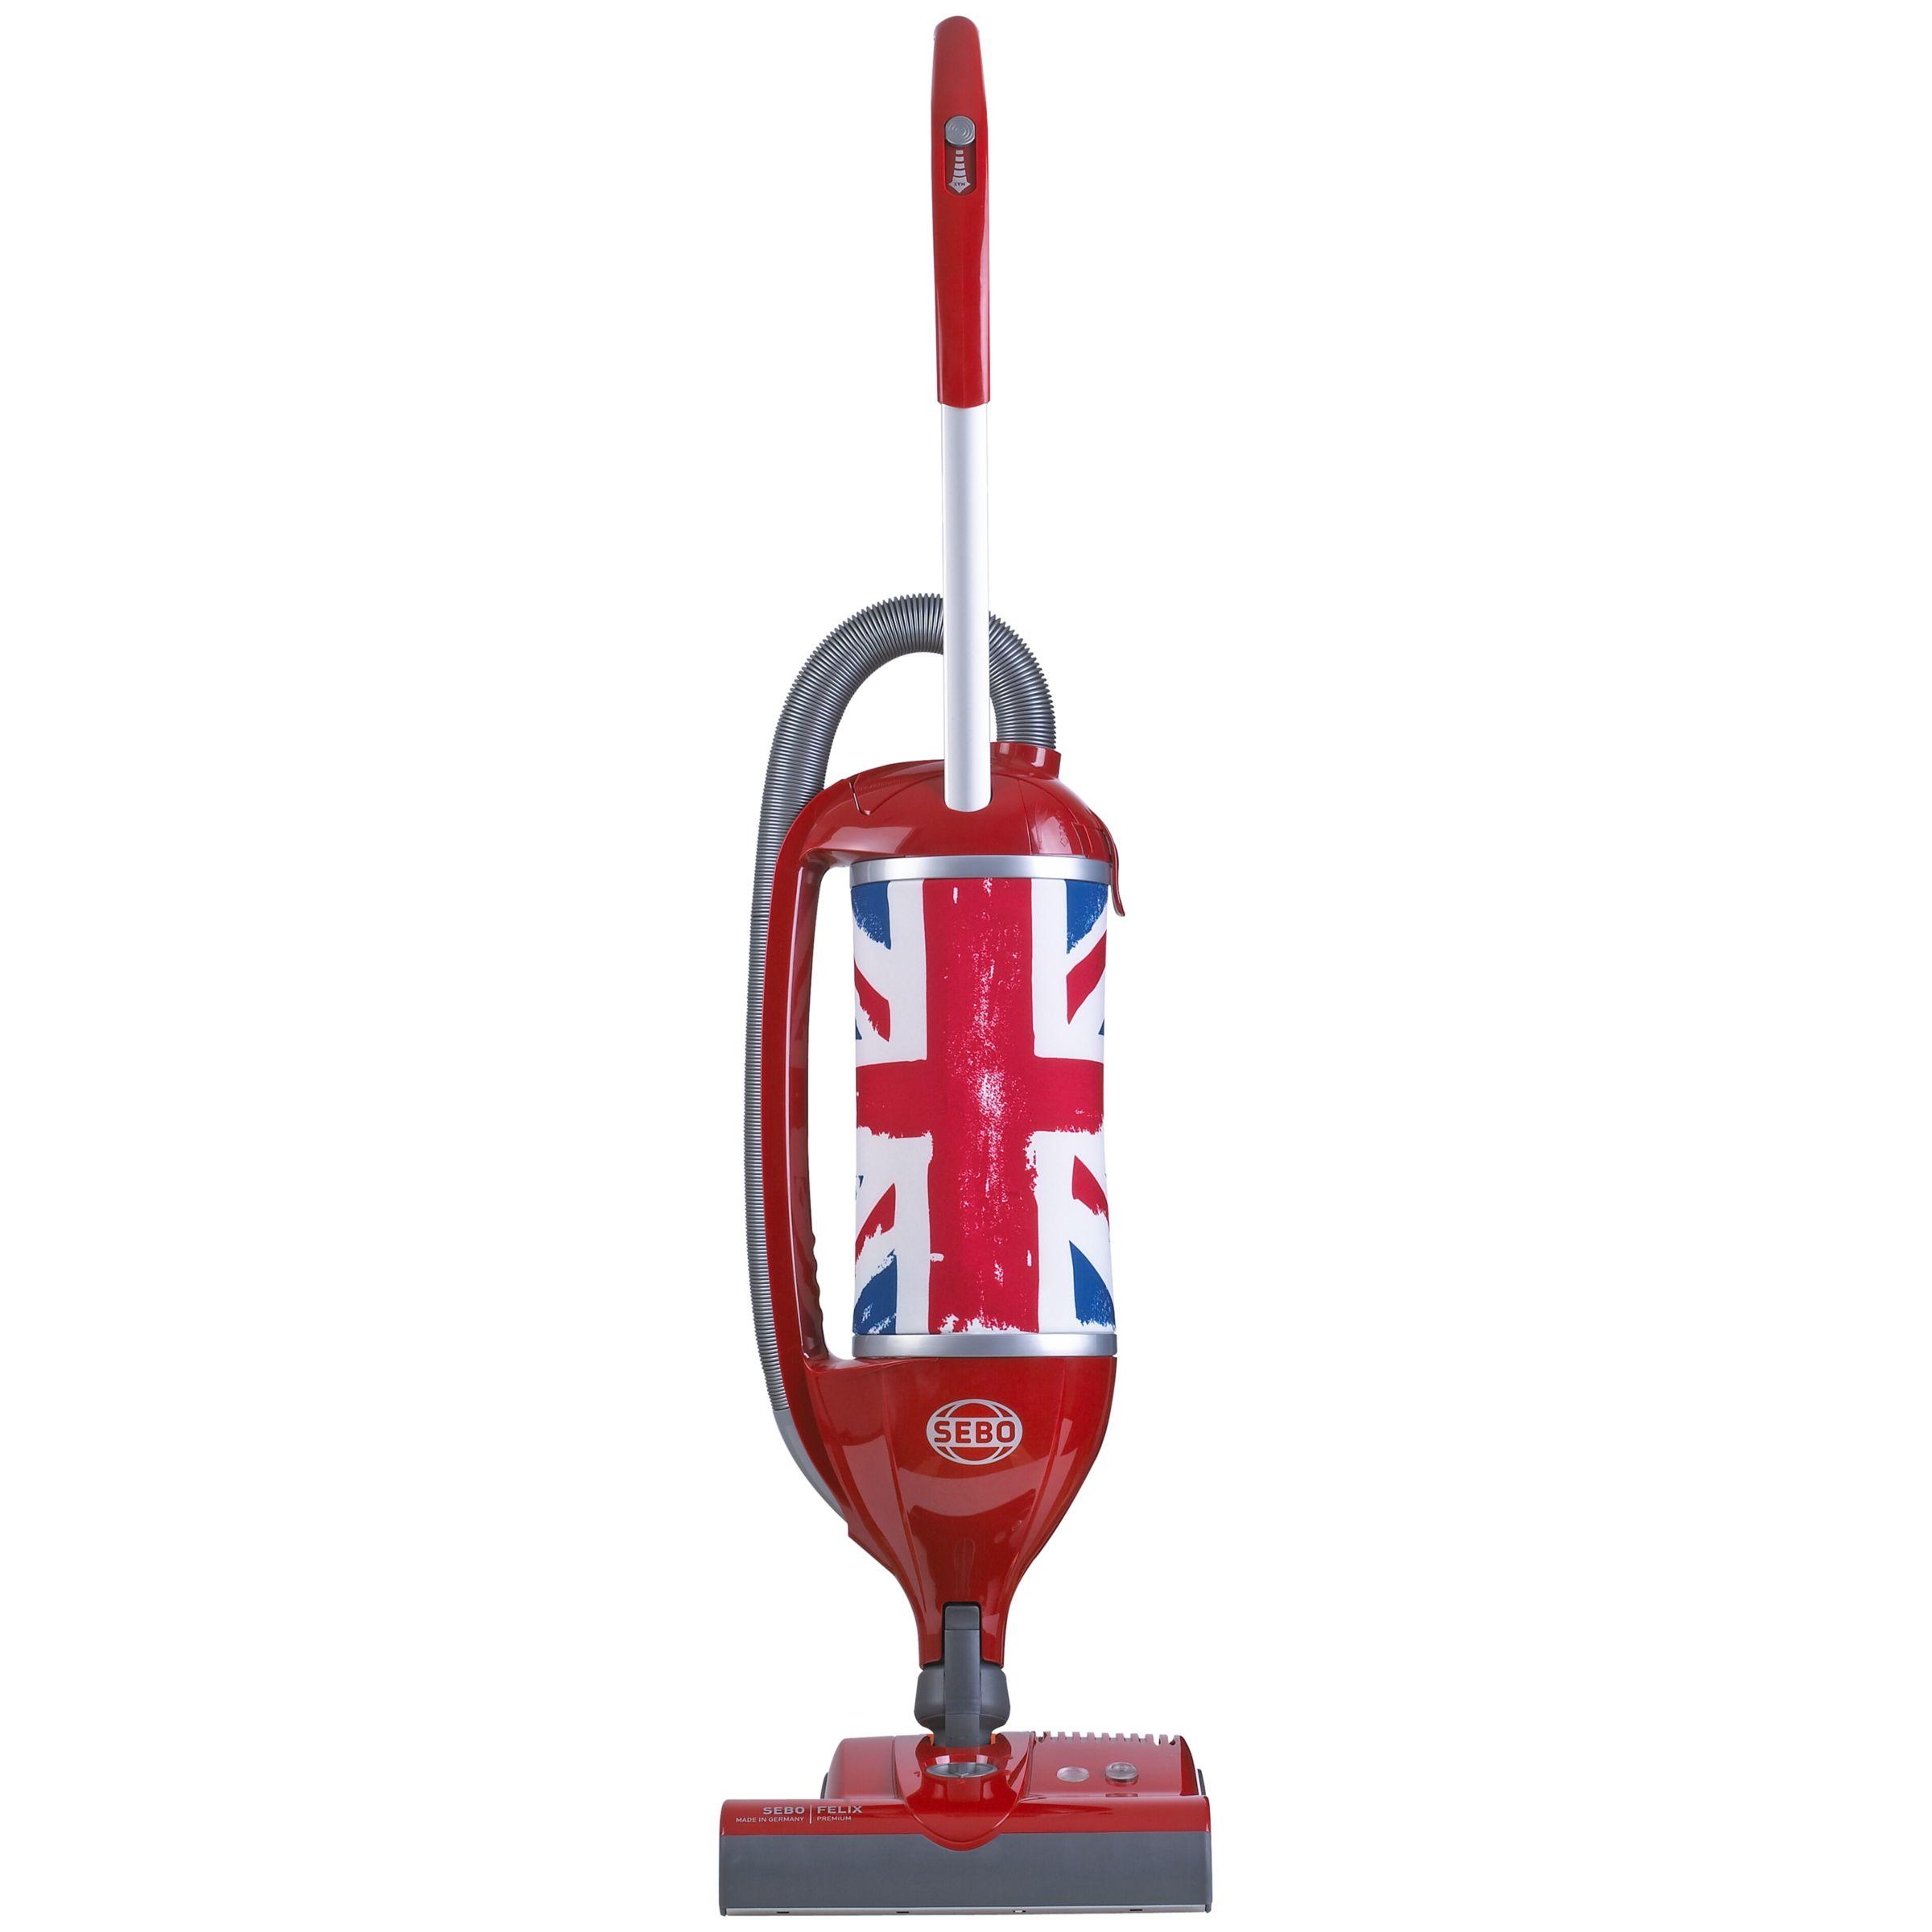 Sebo Sebo Felix Royale Upright Vacuum Cleaner, Red